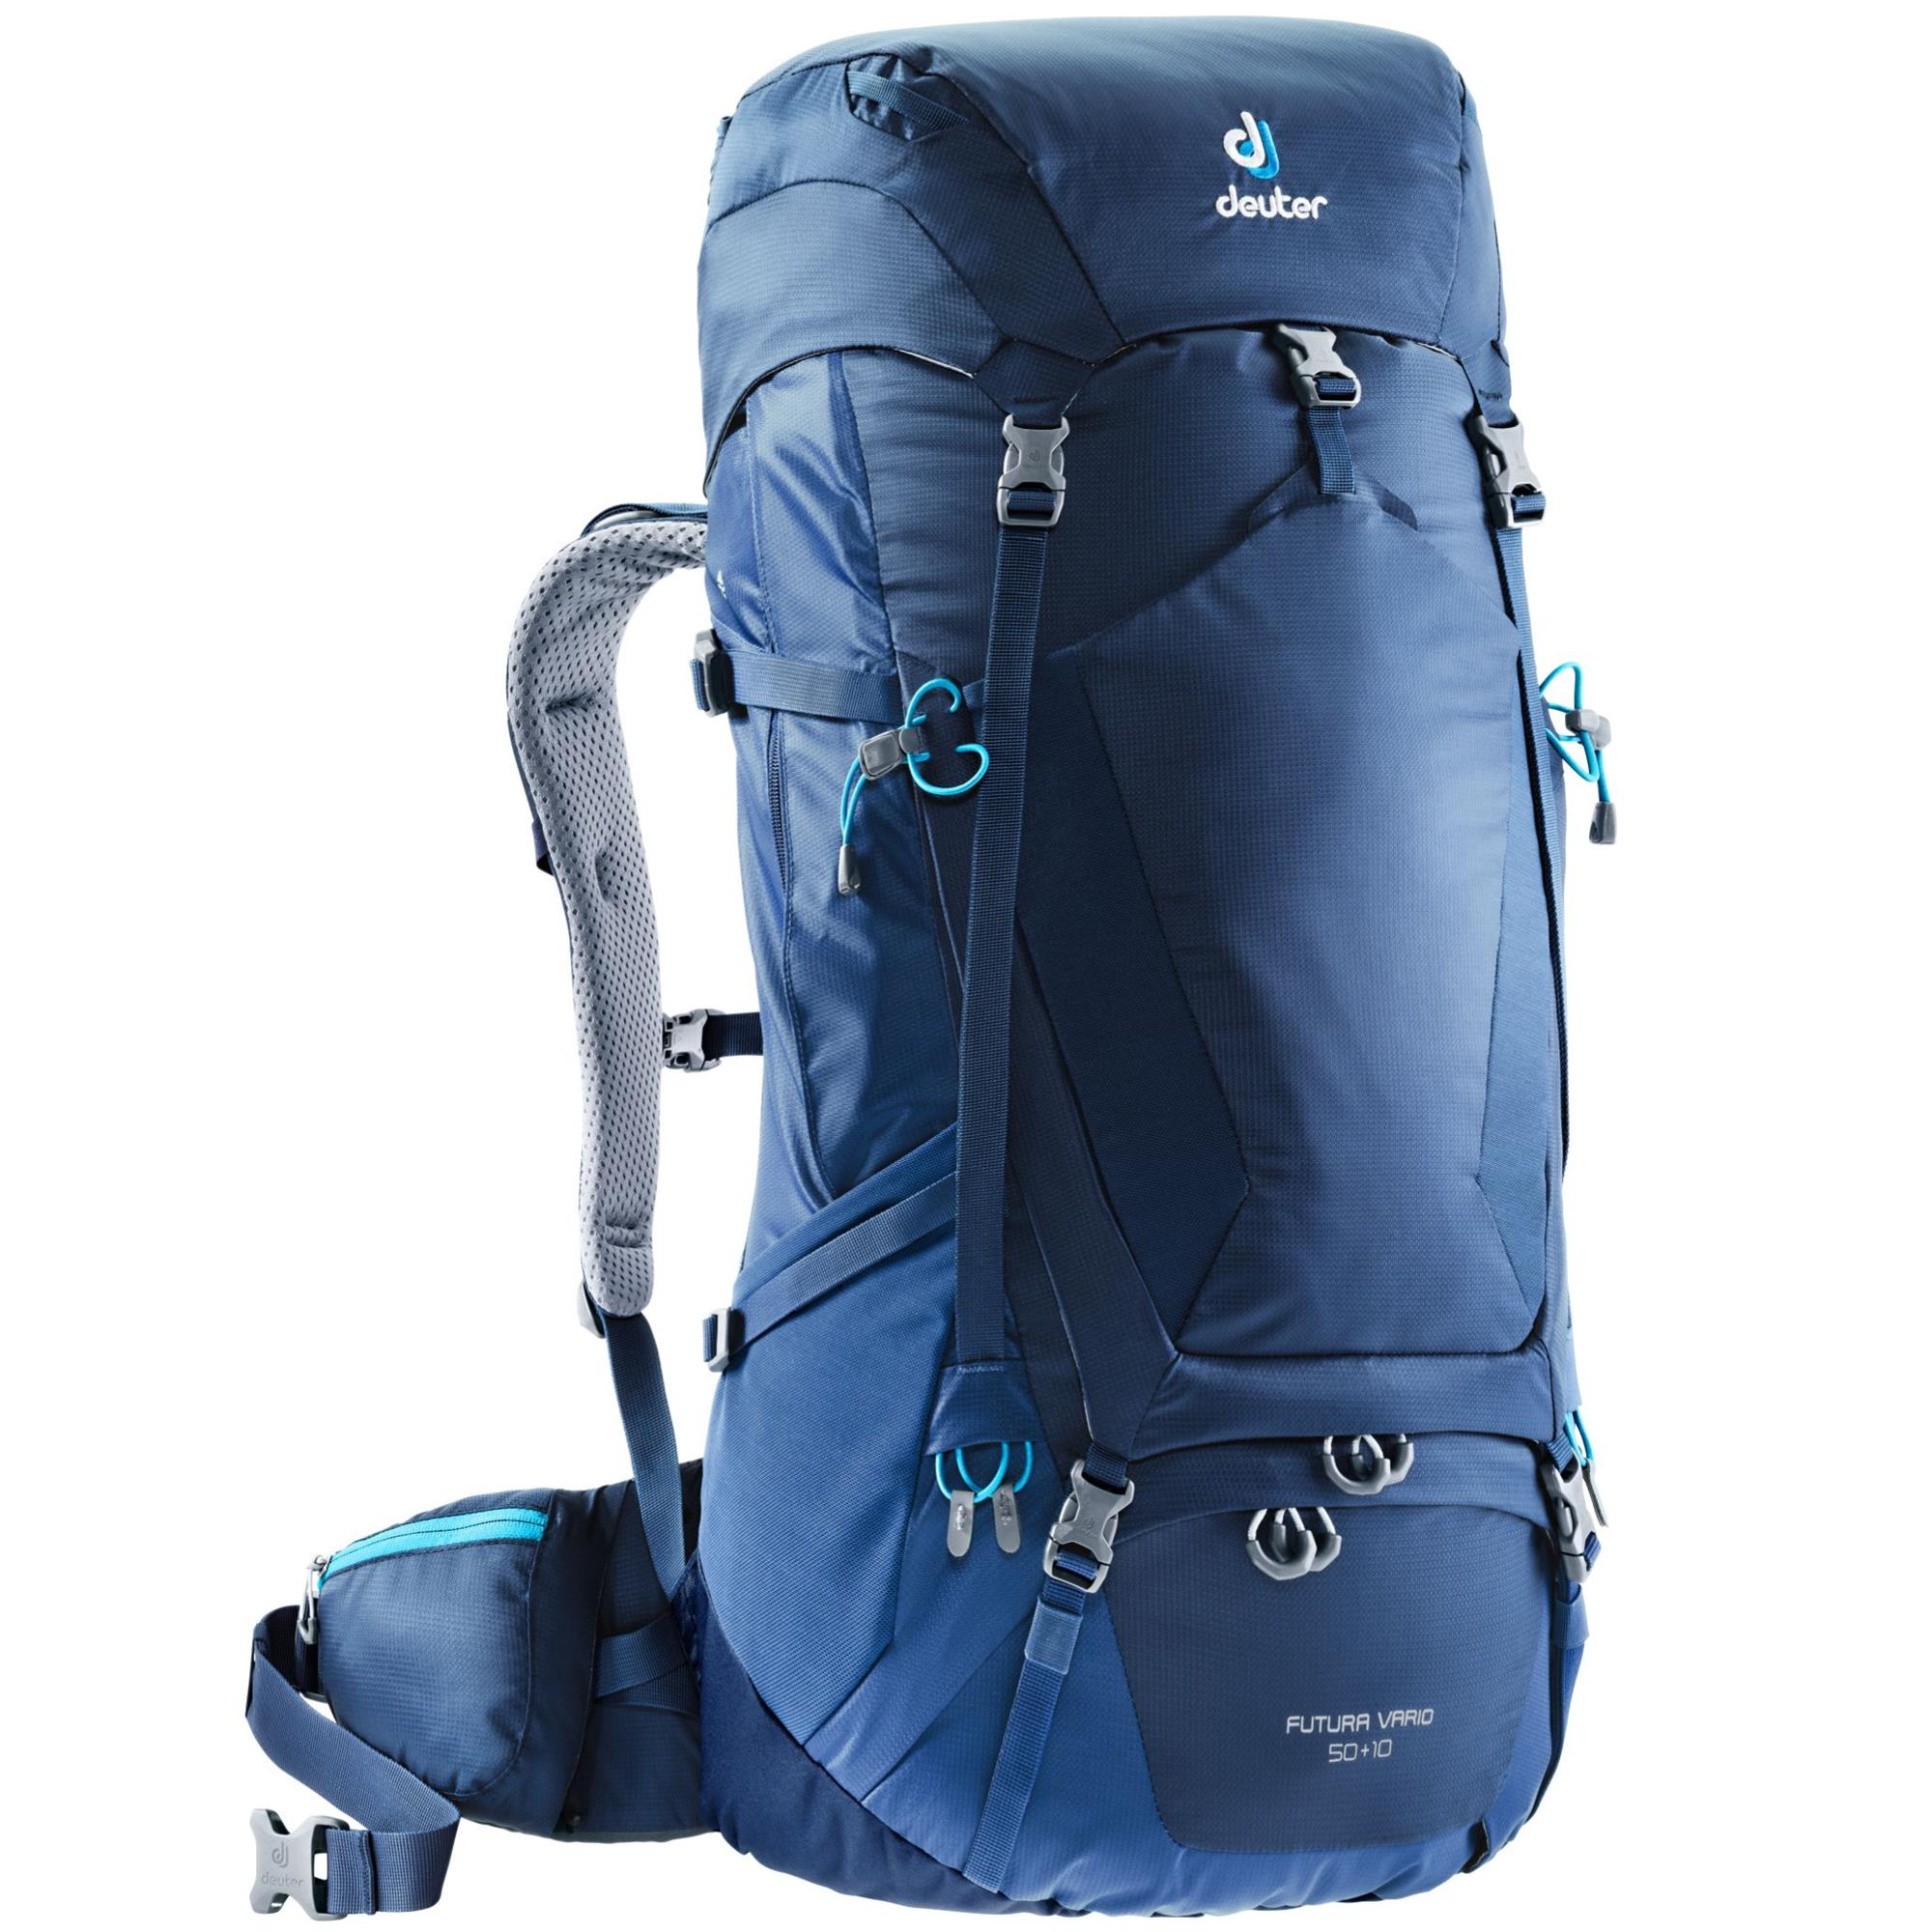 Wander u. Backpacker Rucksack -10000335860 bei Fahrradrucksack-24.de